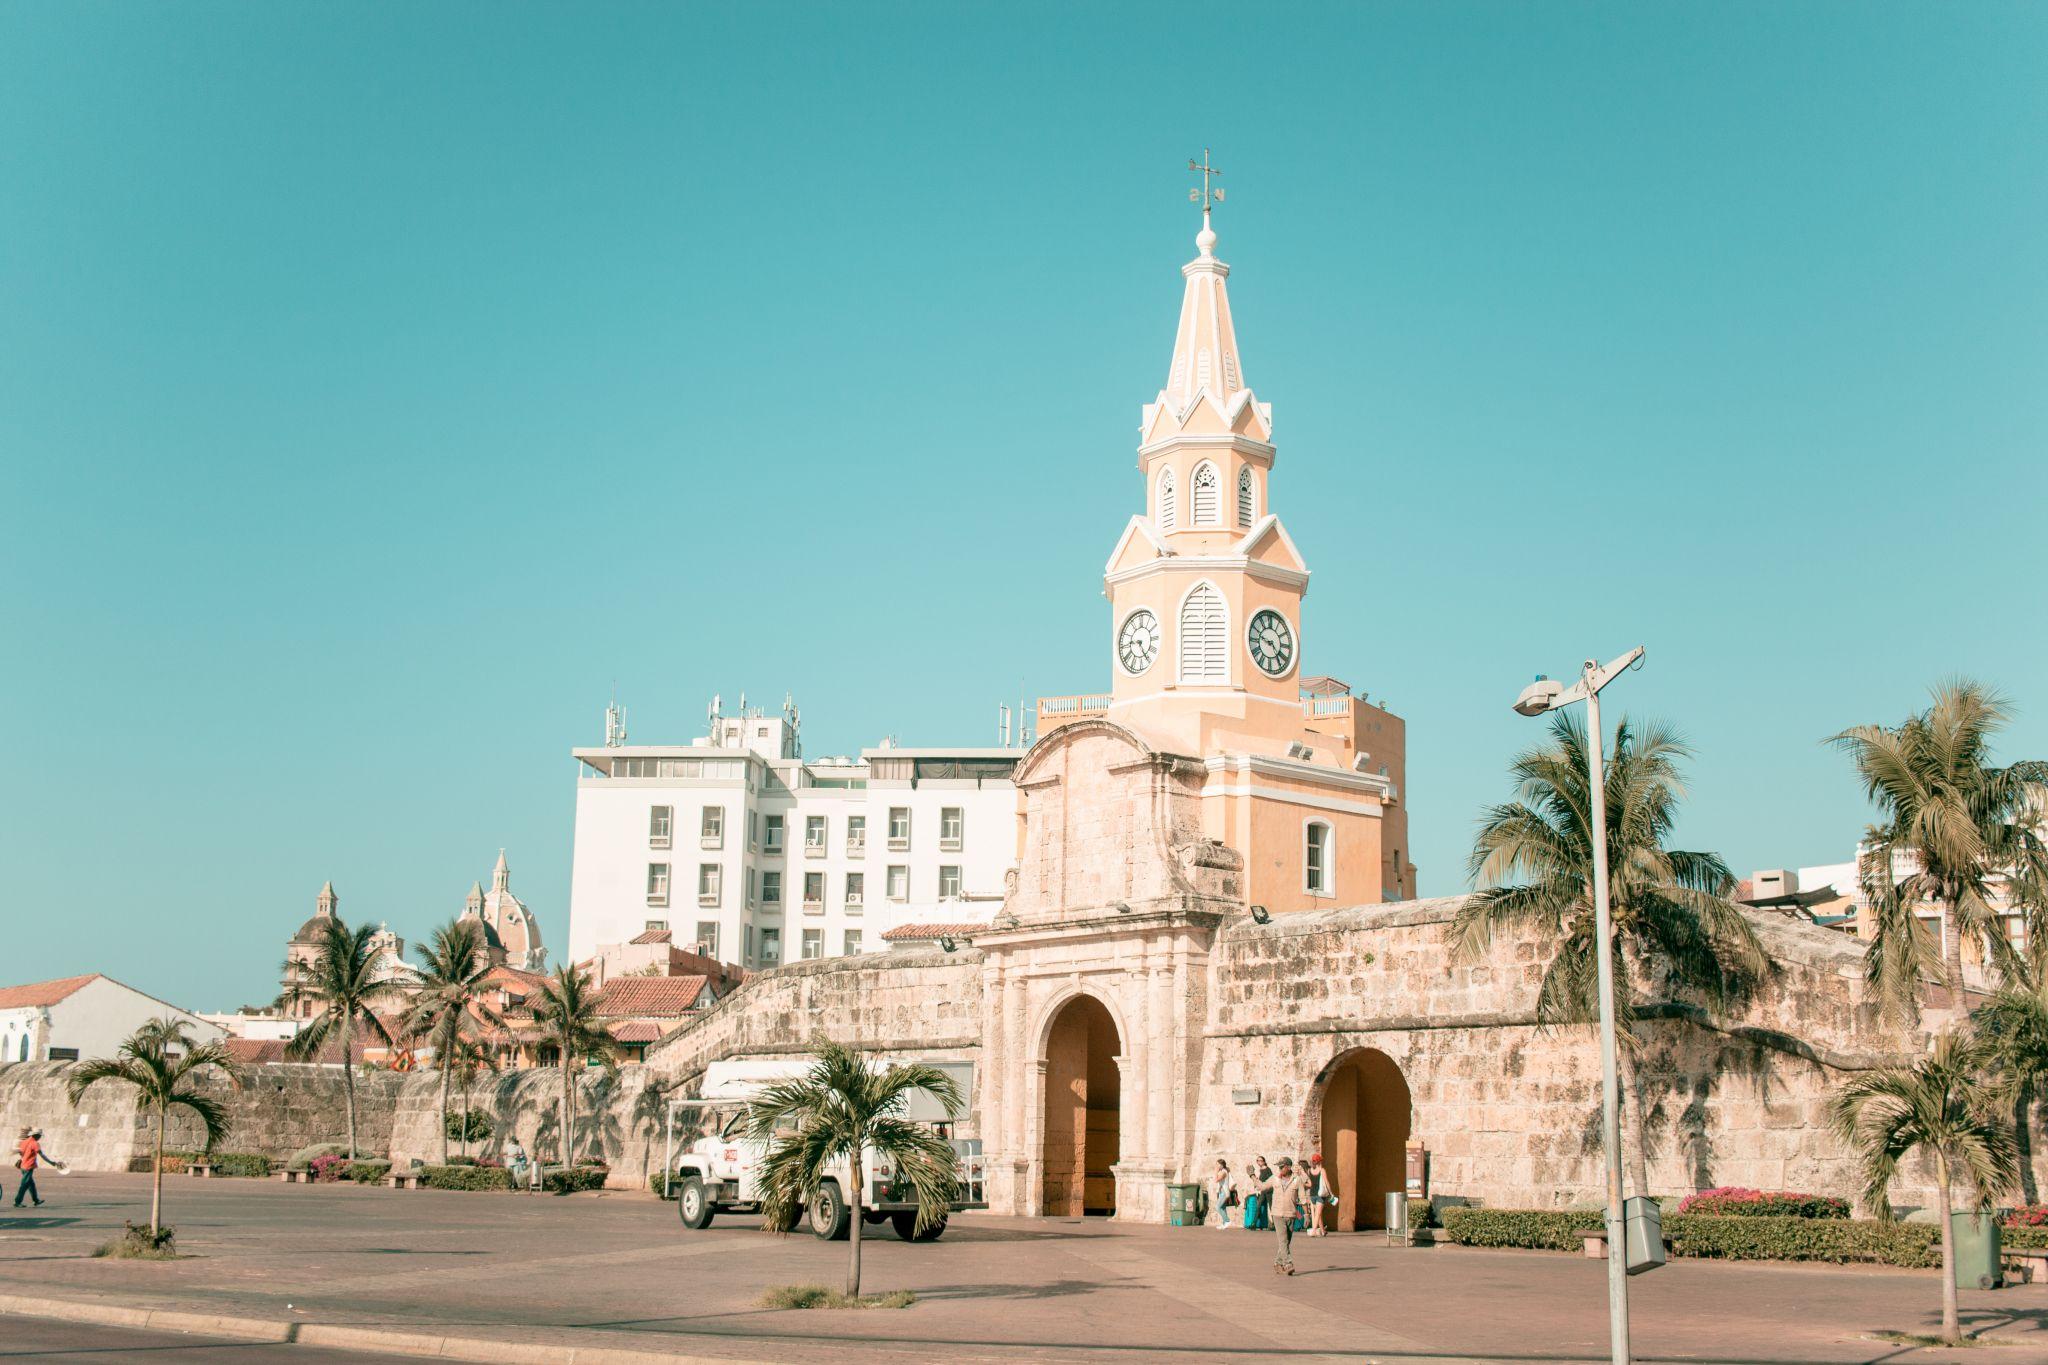 Cartagena Travel Guide Colombia Torre del Reloj